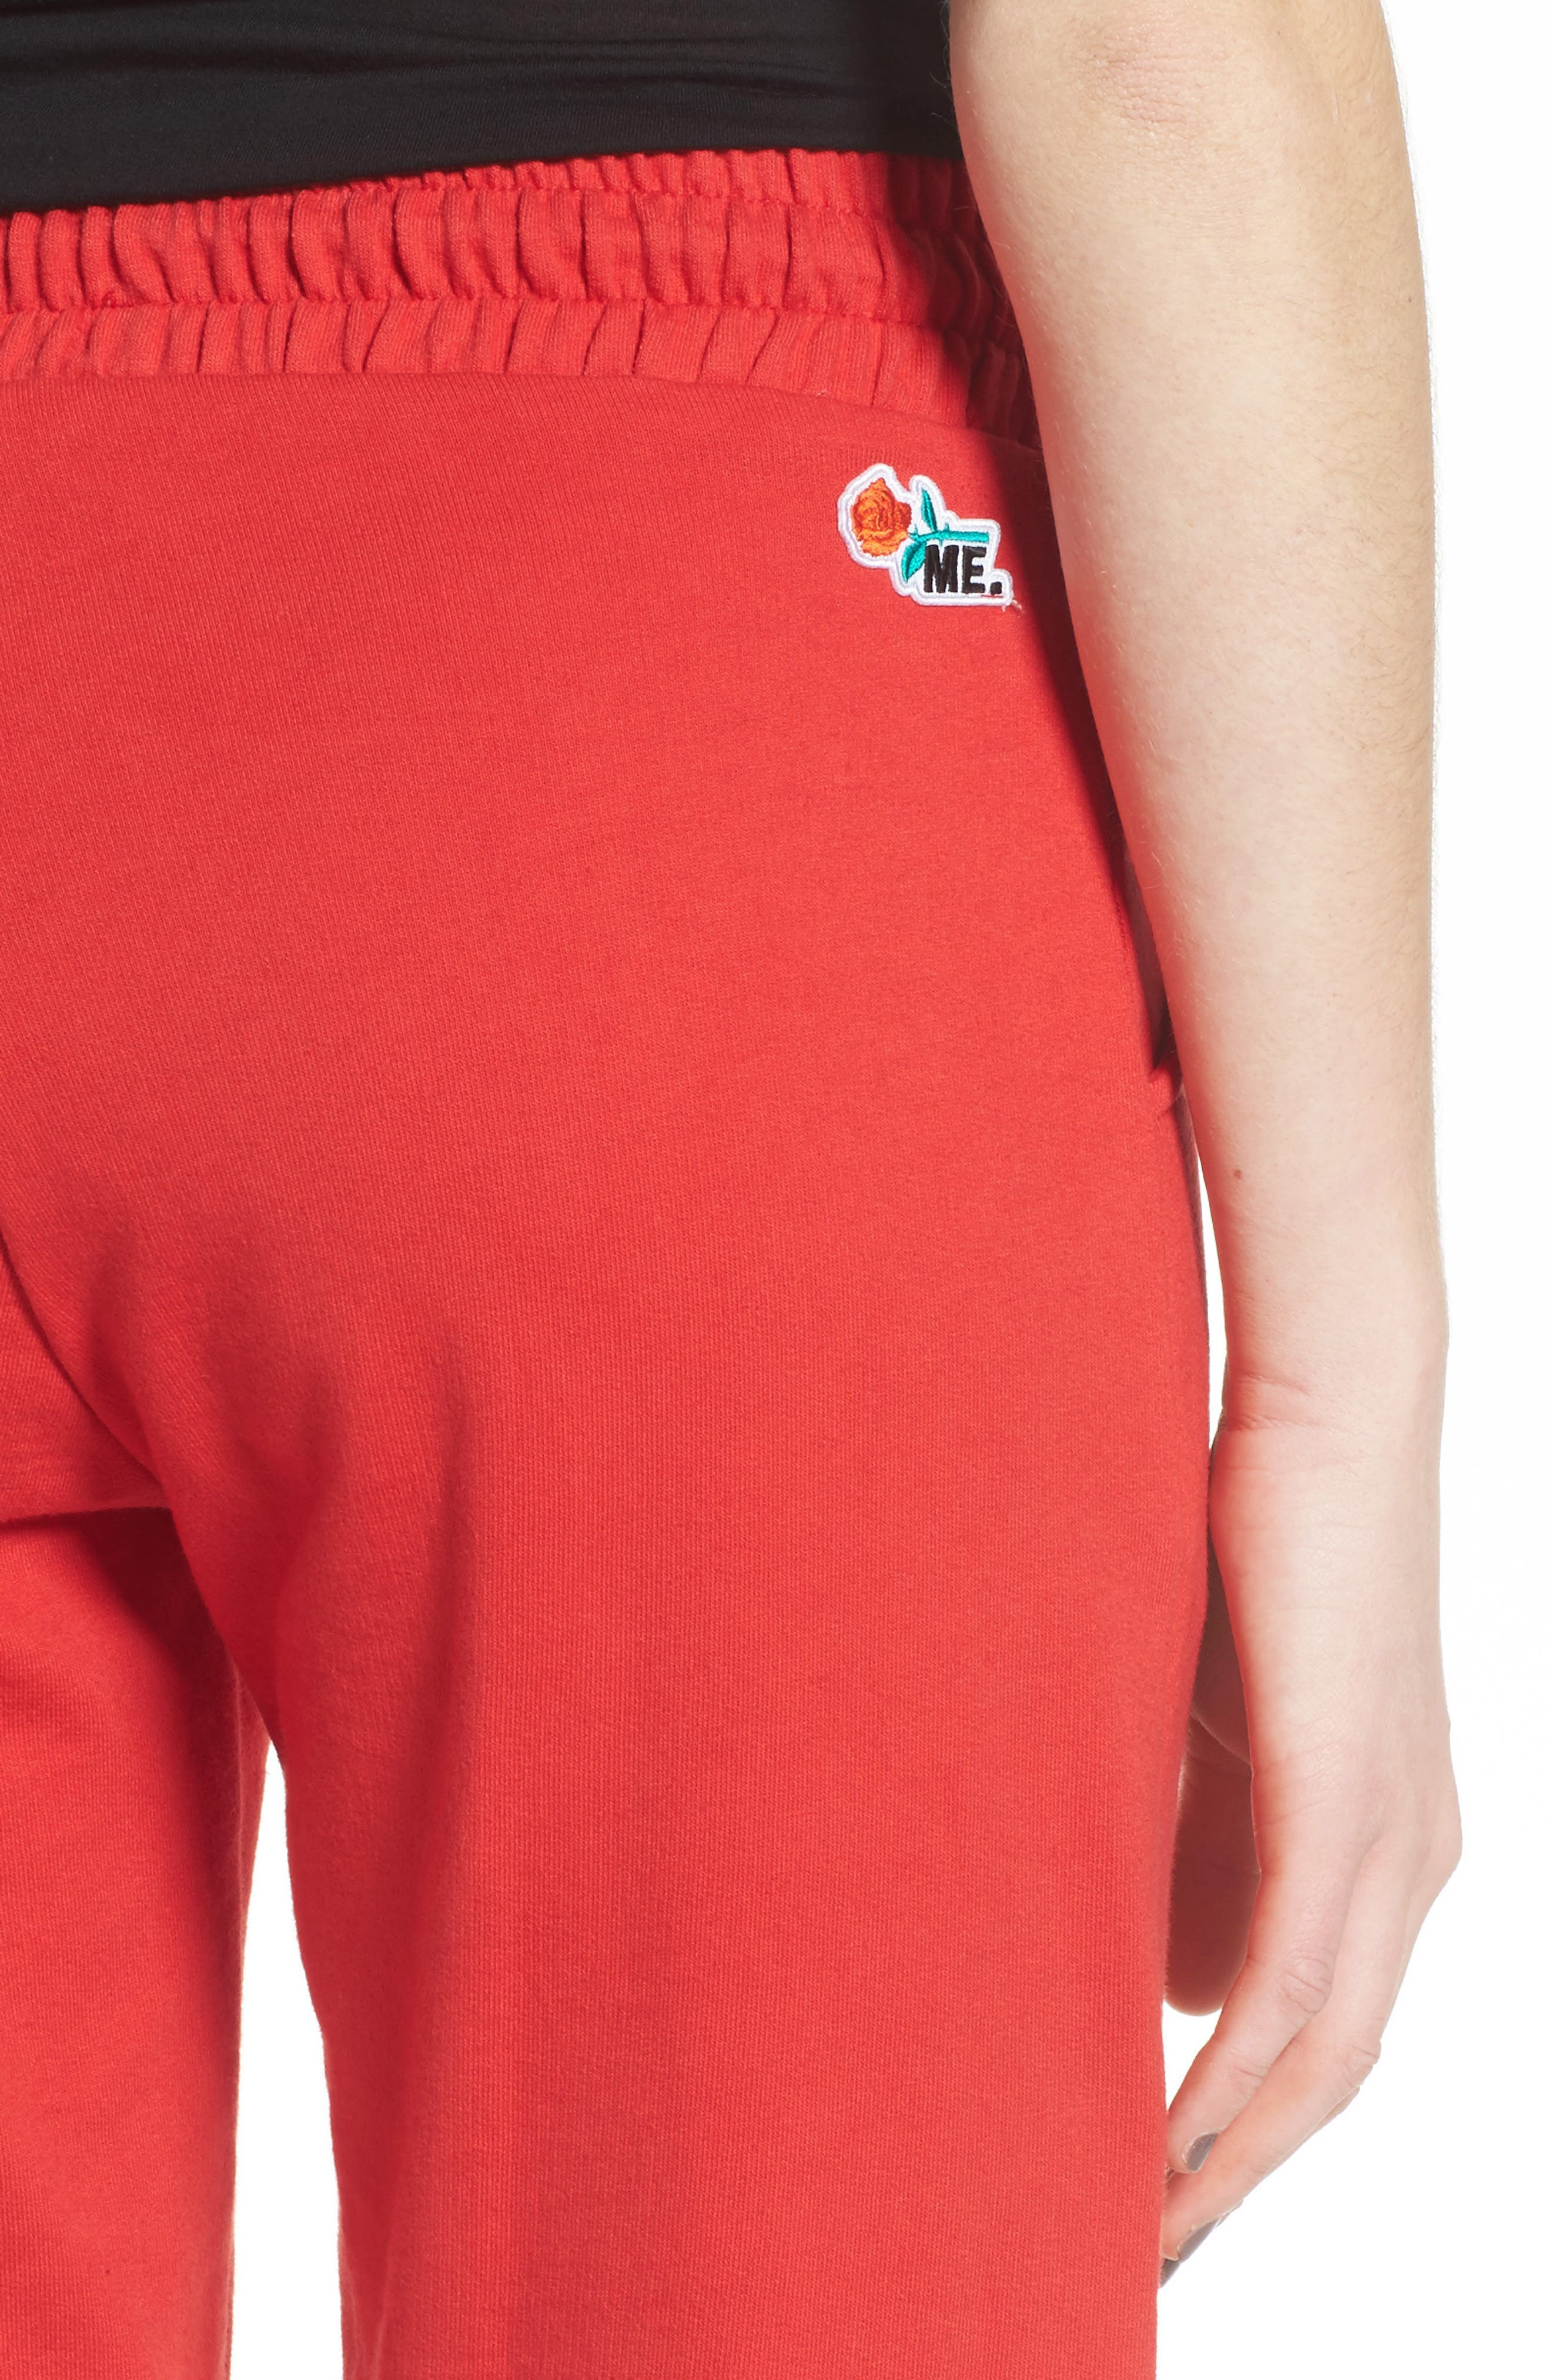 ME. Rose Sweatpants,                             Alternate thumbnail 6, color,                             CHERRY RED